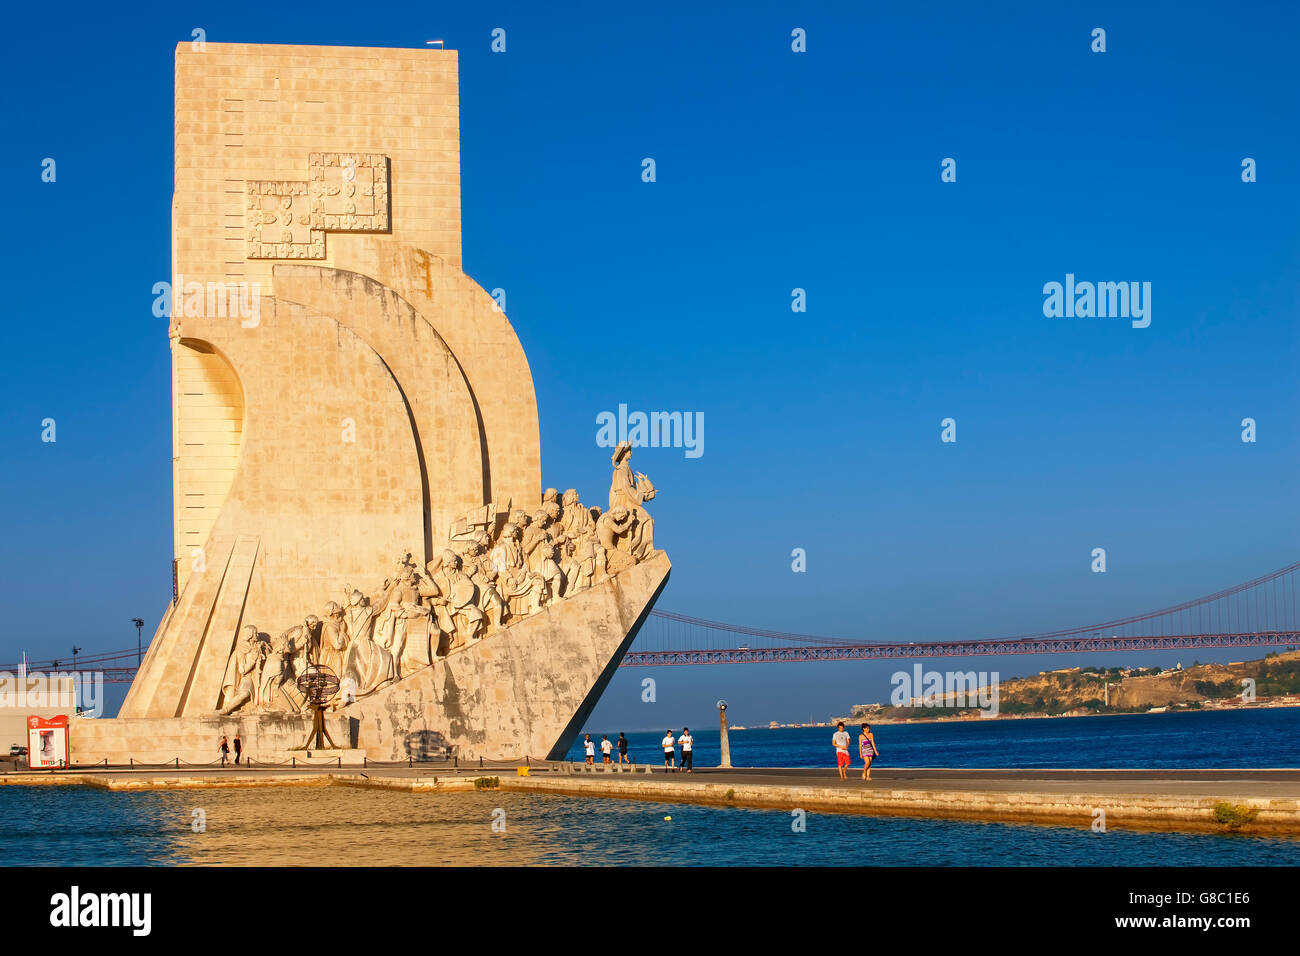 Il monumento alle scoperte in Belem, Lisbona Immagini Stock